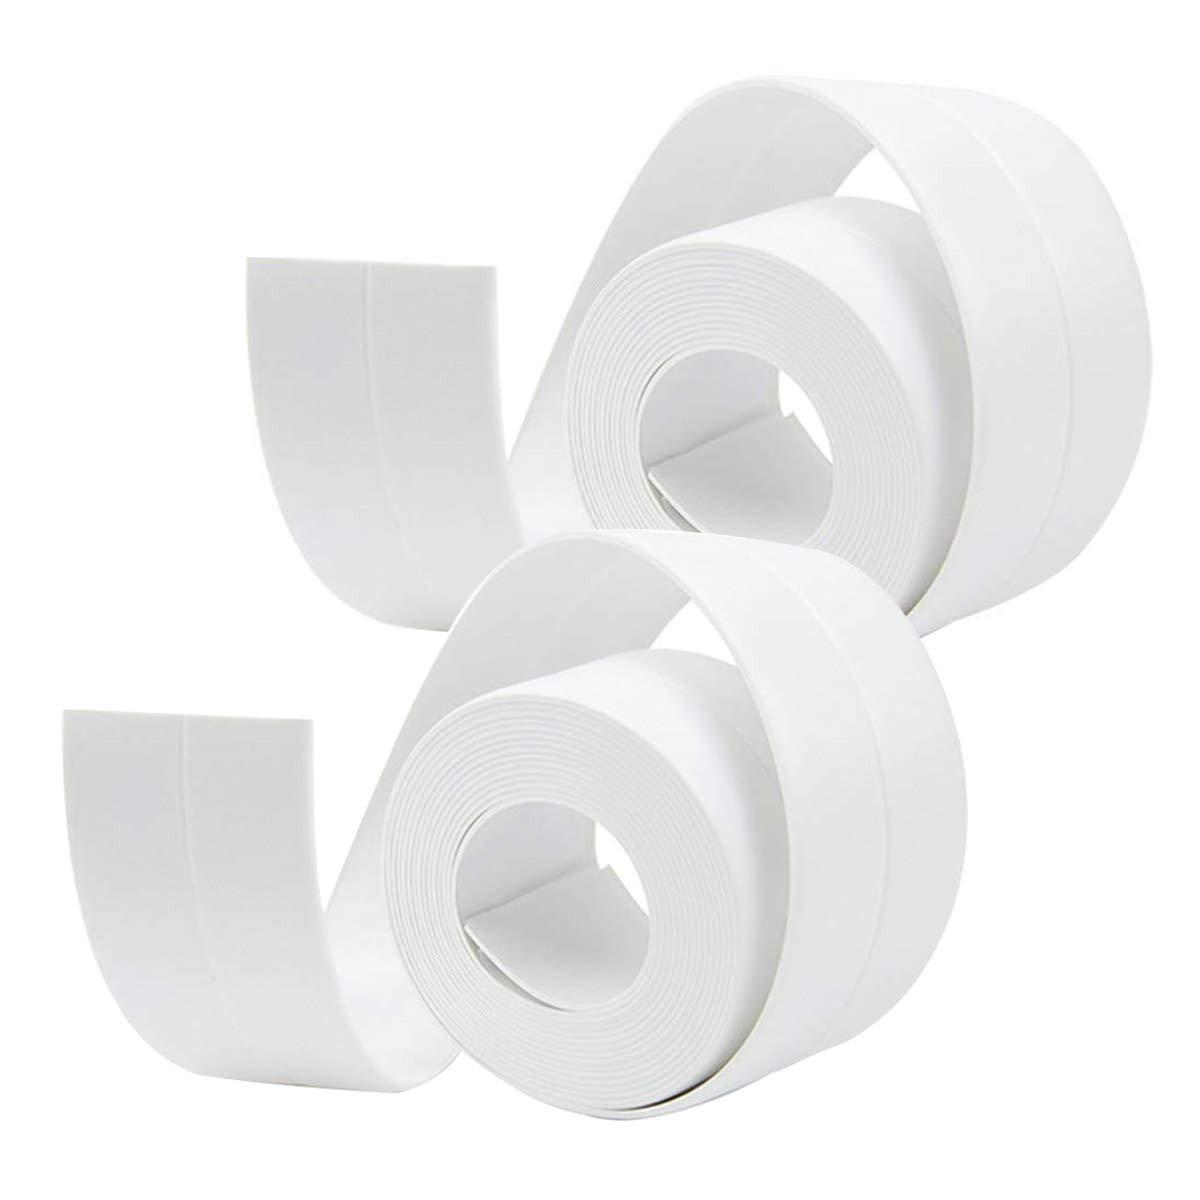 Tub and Wall Sealing Caulk Strip Wall and Corner Self Adhesive Peel and Caulk Strip Fixture Tape Caulk Sealer Tub Surround Waterproof Decorative Sealer Trim Pack of 2 (Grey) Bloomoak